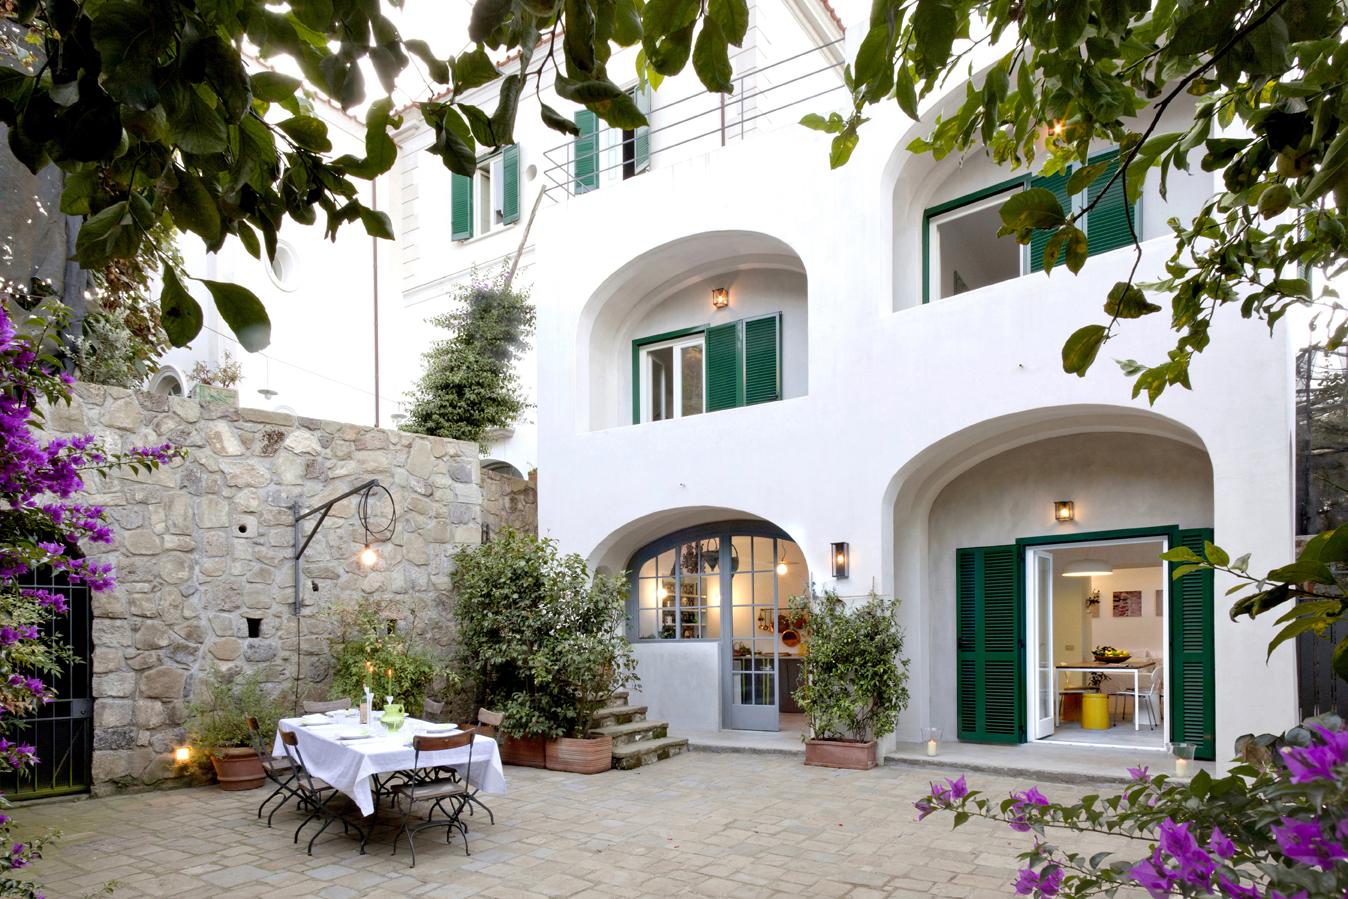 Luxury Design Villa with Pool in Lemon Grove   Villen zur Miete in ...